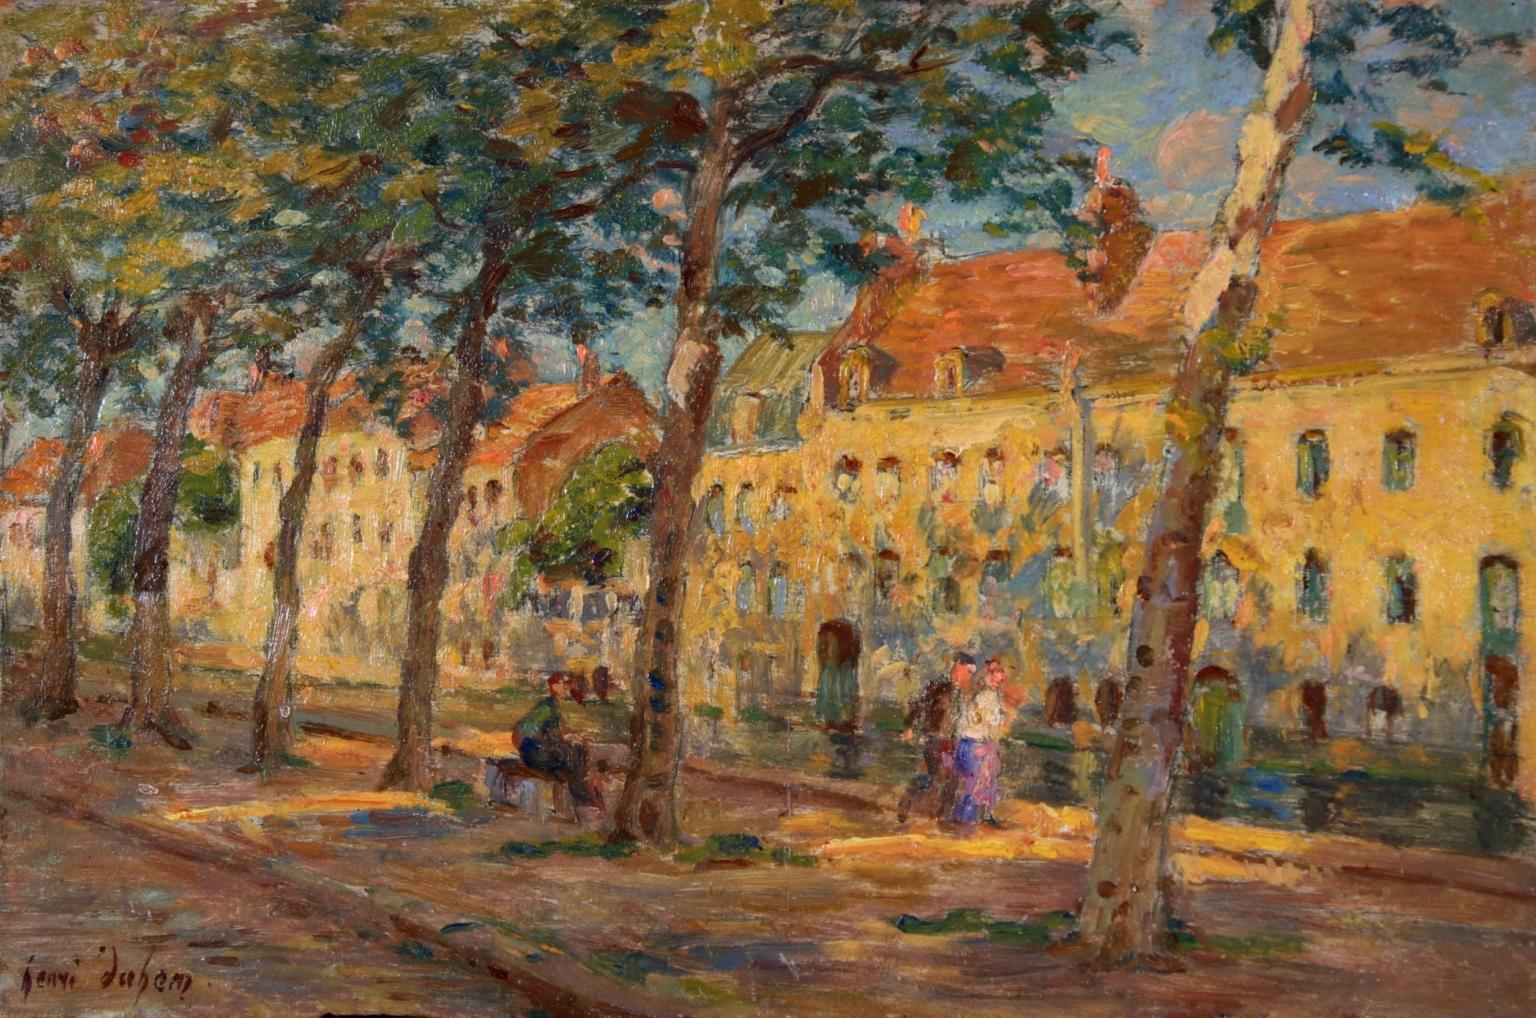 Au bord du canal - Impressionist Oil, Figures by Canal in Landscape, Henri Duhem